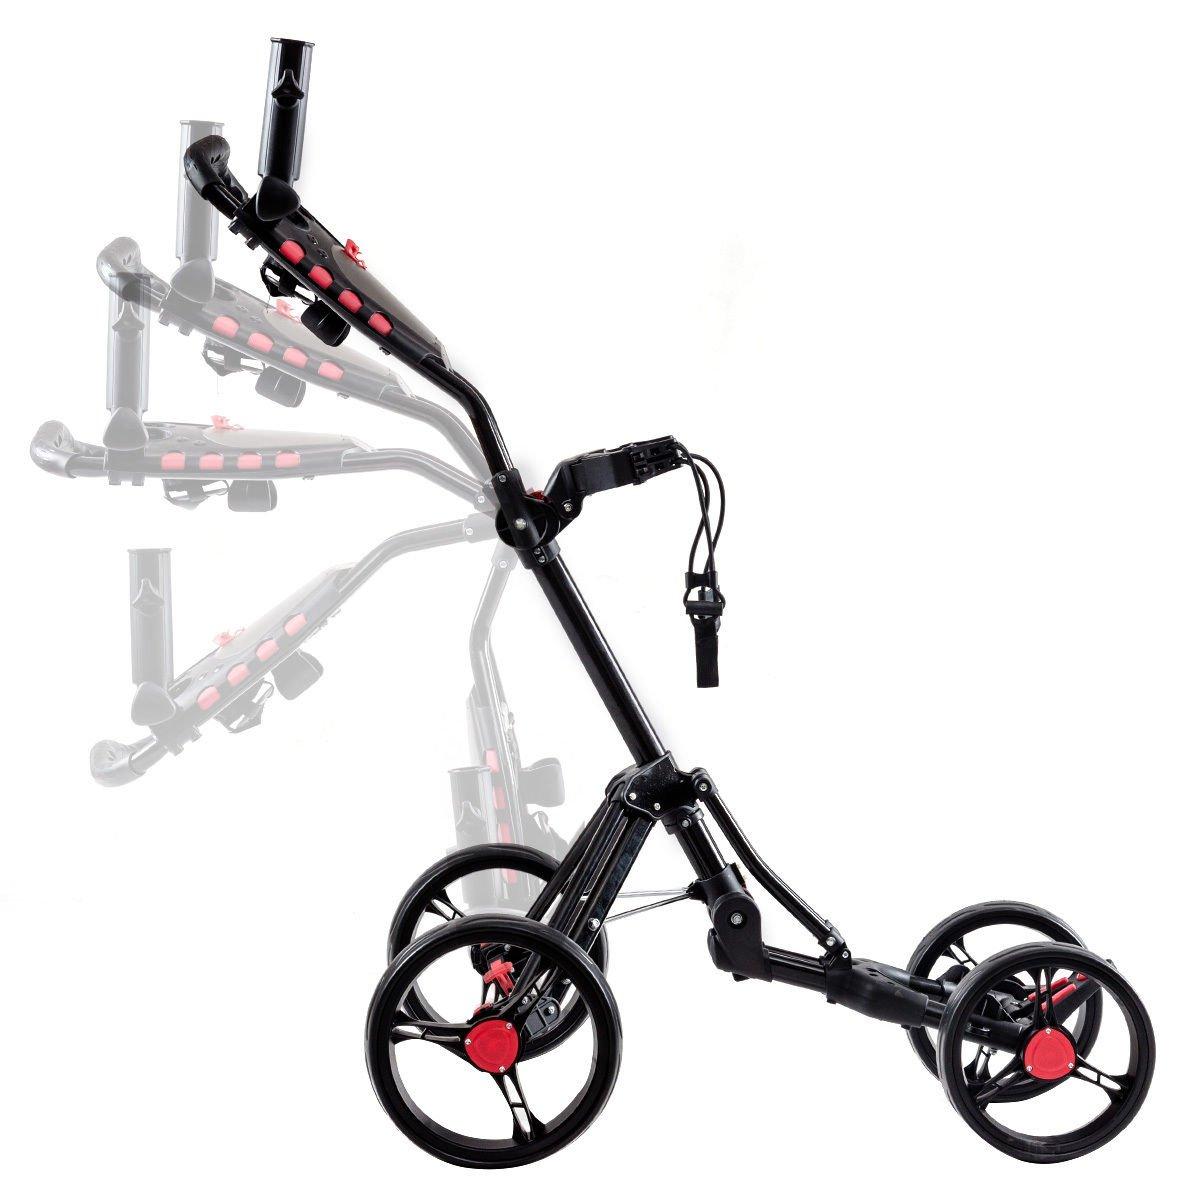 Amazon.com: Colibrox - Carrito plegable de 4 ruedas, palo de ...